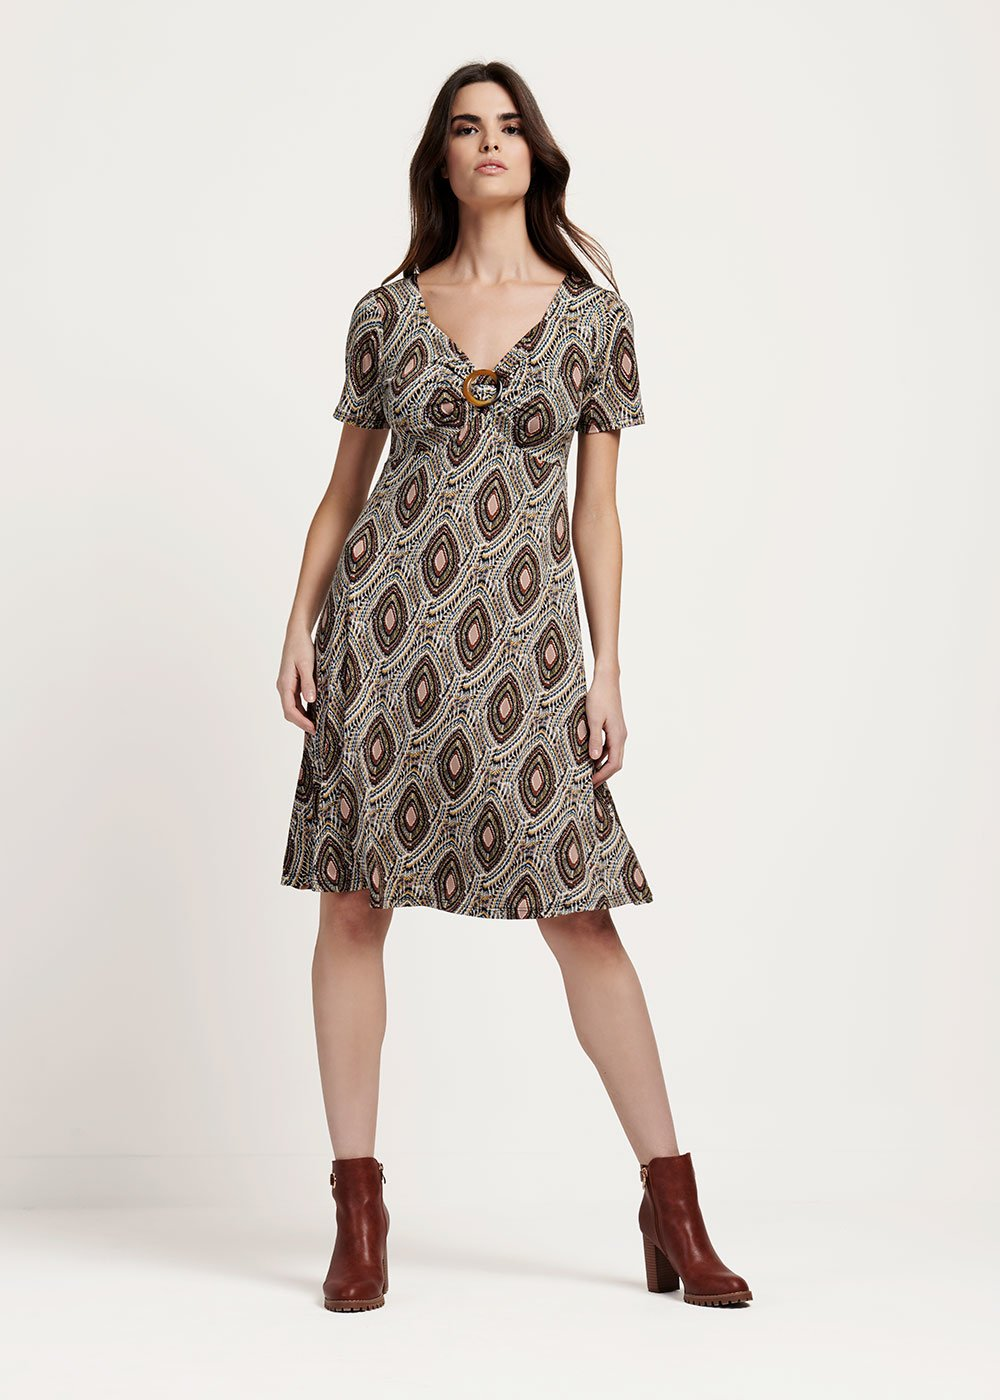 Aleisha v-neck dress with buckle detail - Skin / Cacao-Fantasia - Woman